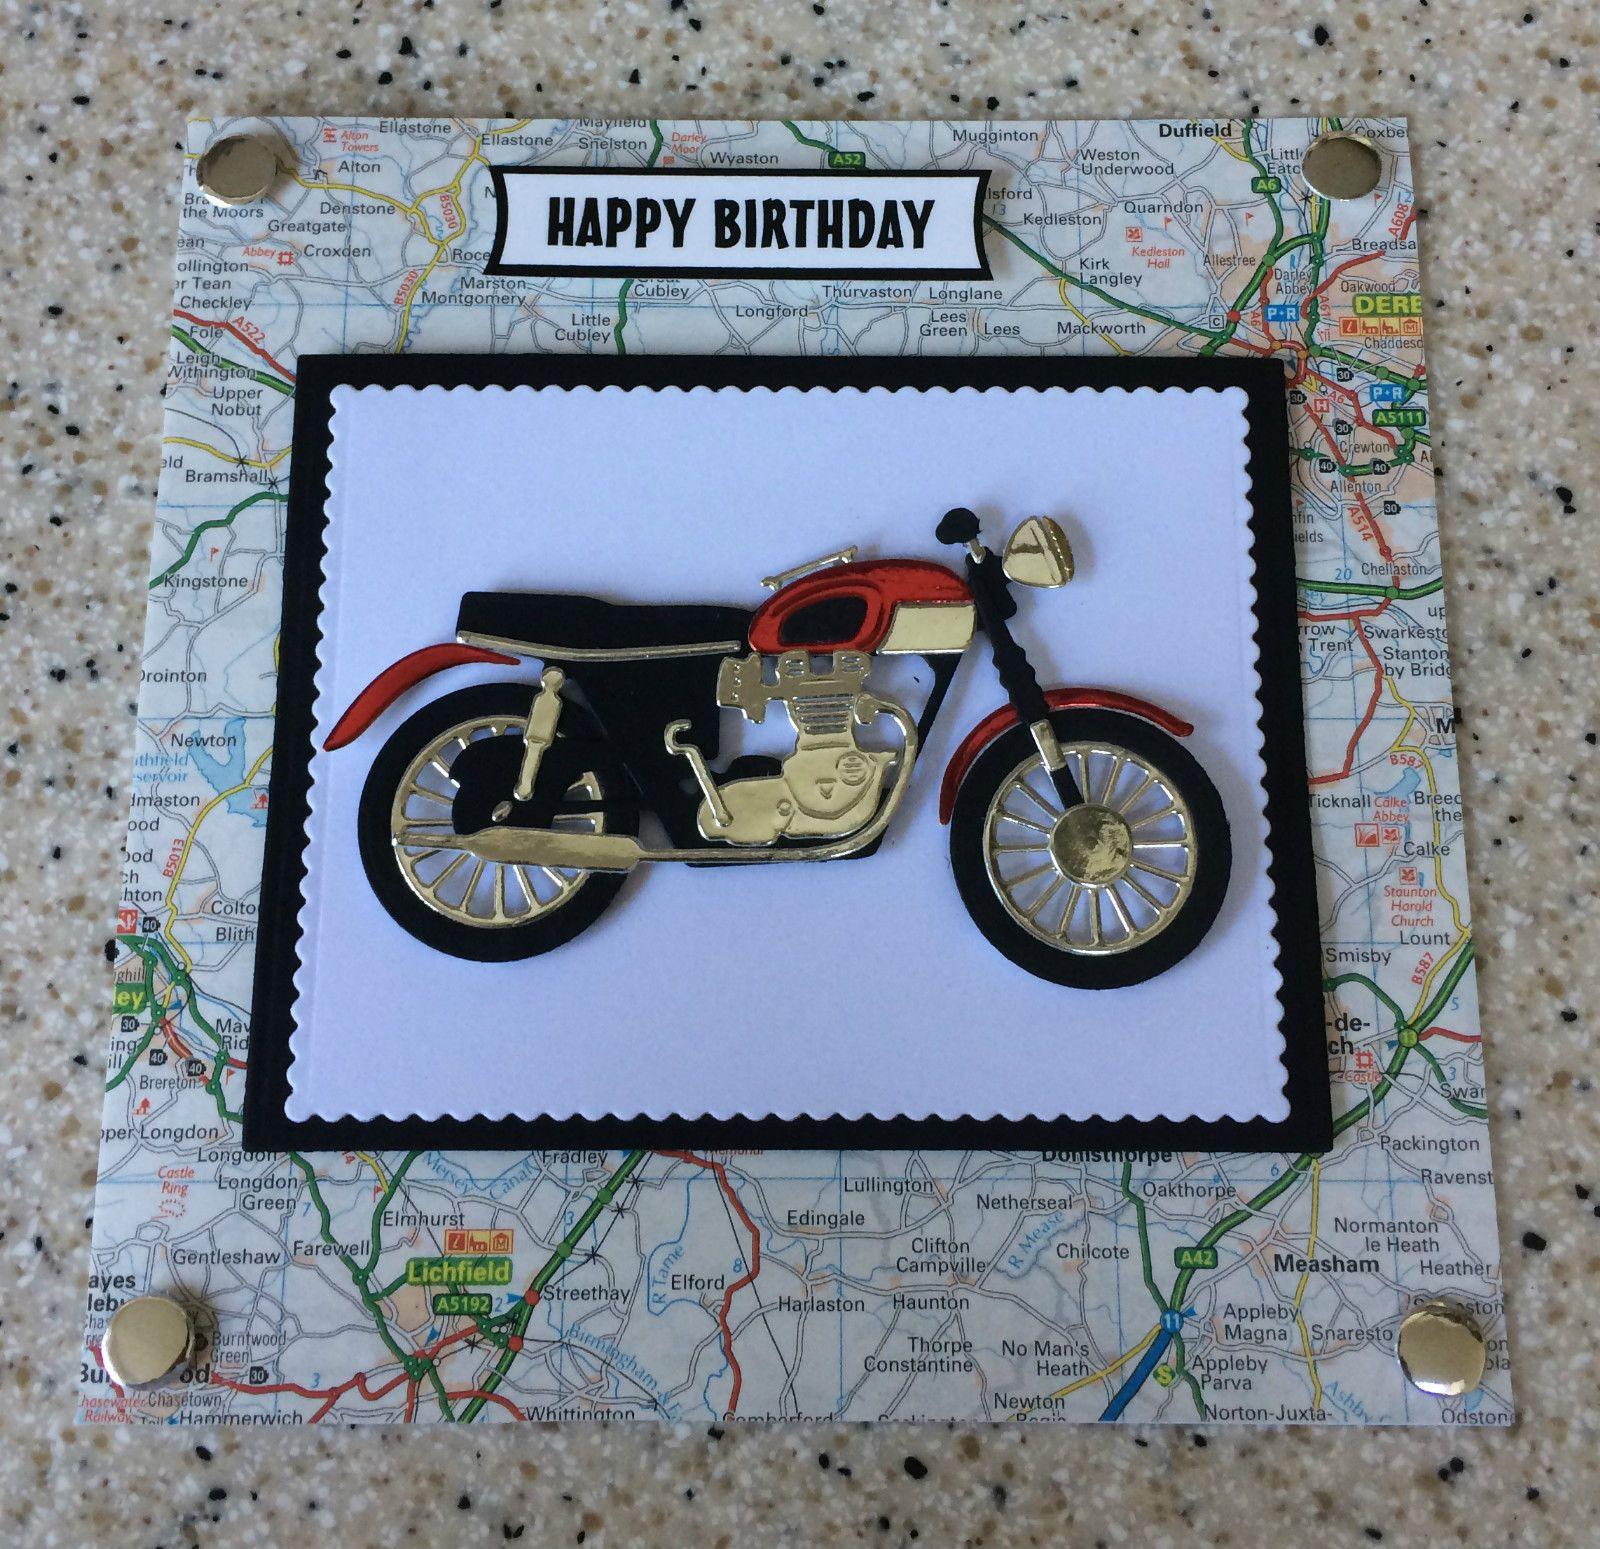 Handmade Motorbike Biker Bike Road Map Happy Birthday Card 6 9 Colour Options Birthday Cards For Men Cool Birthday Cards 60th Birthday Cards